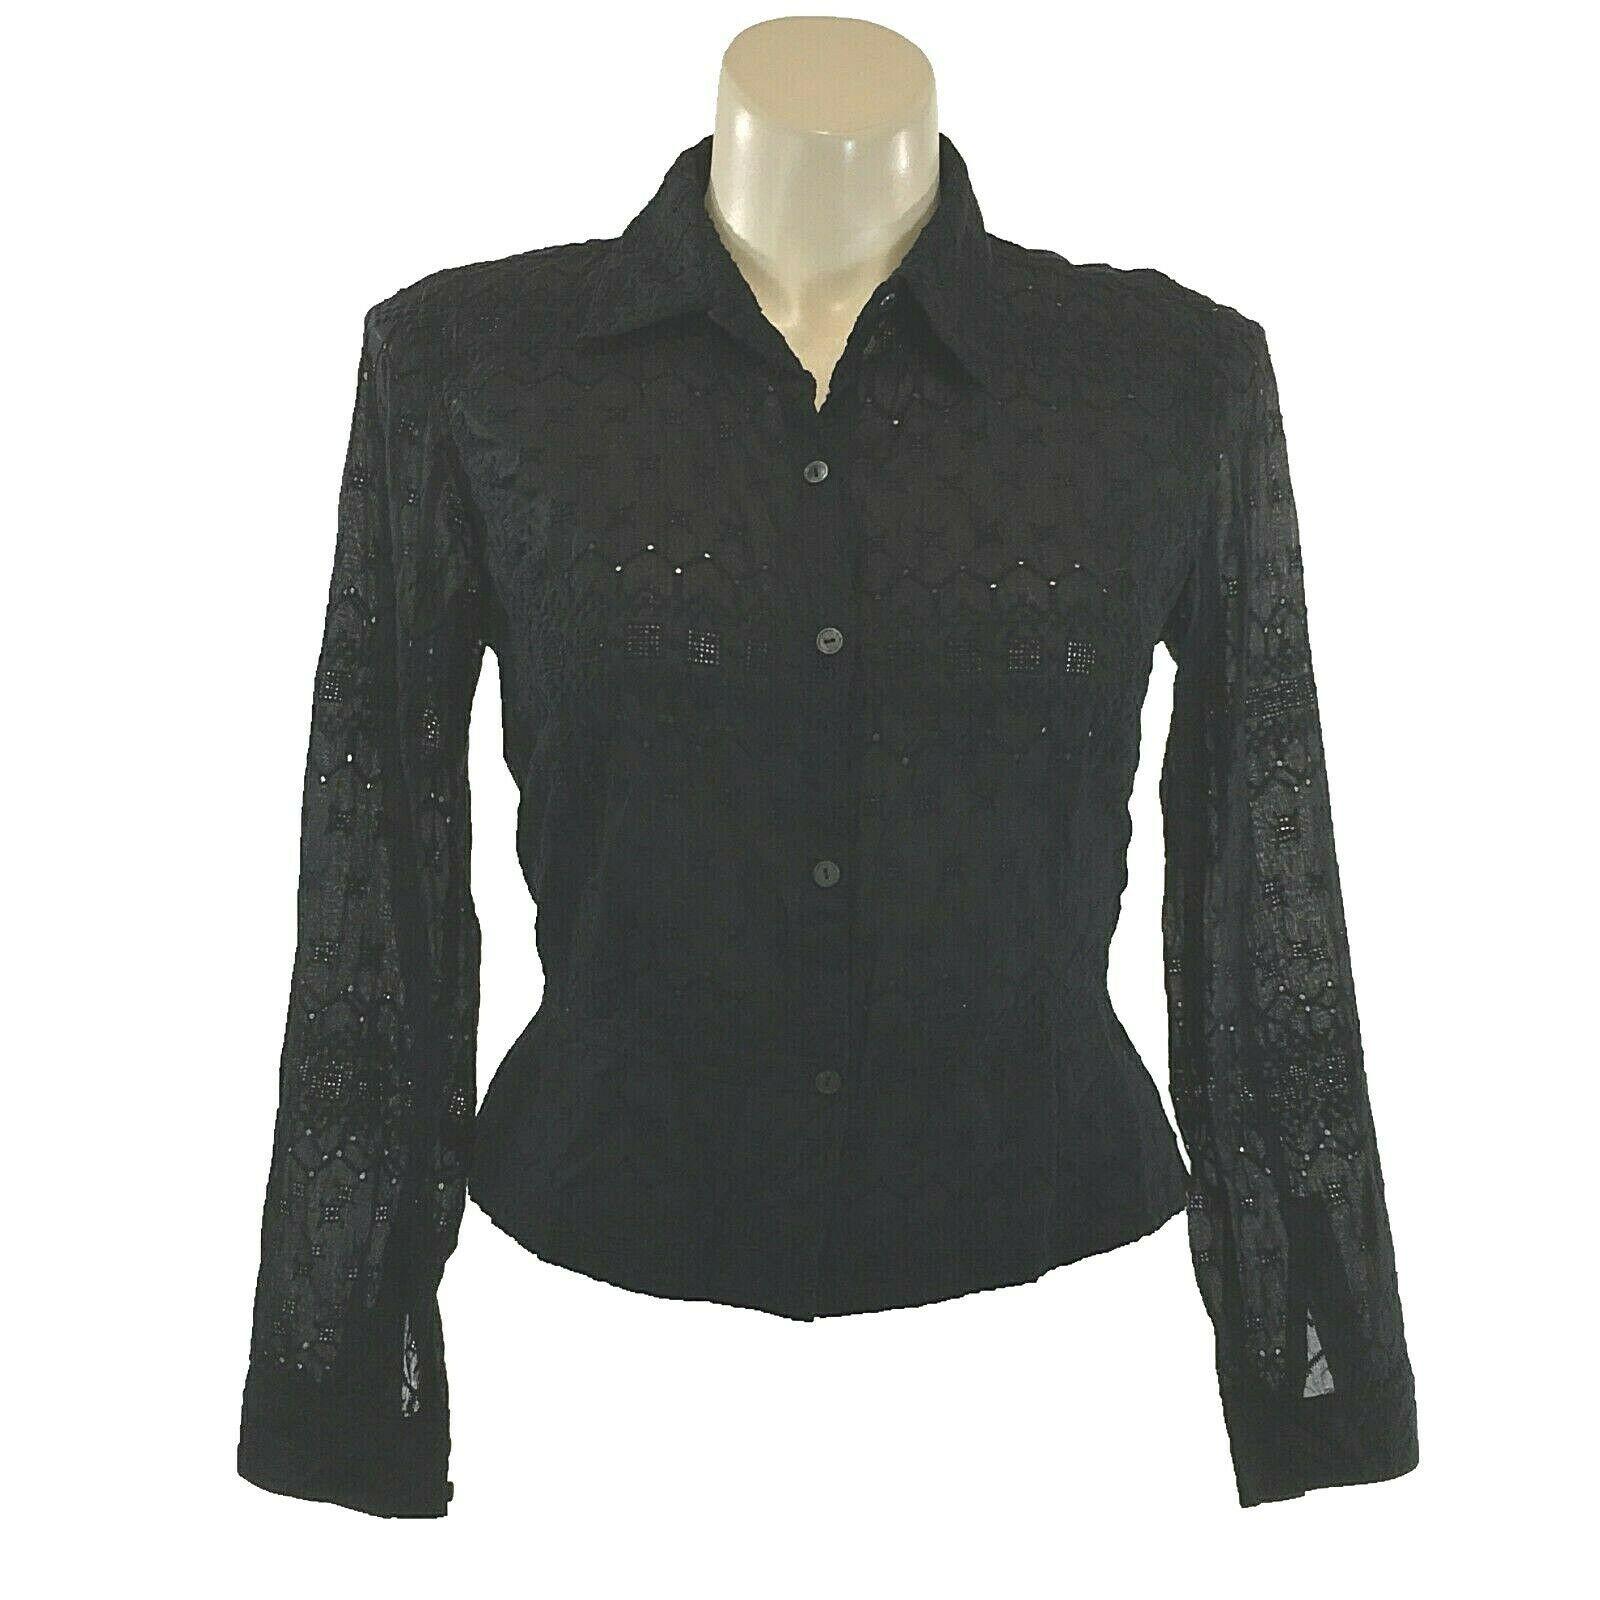 Calvin Klein 14 Large Top Button Shirt Black Eyelet Dot Square Texture Peplum LN